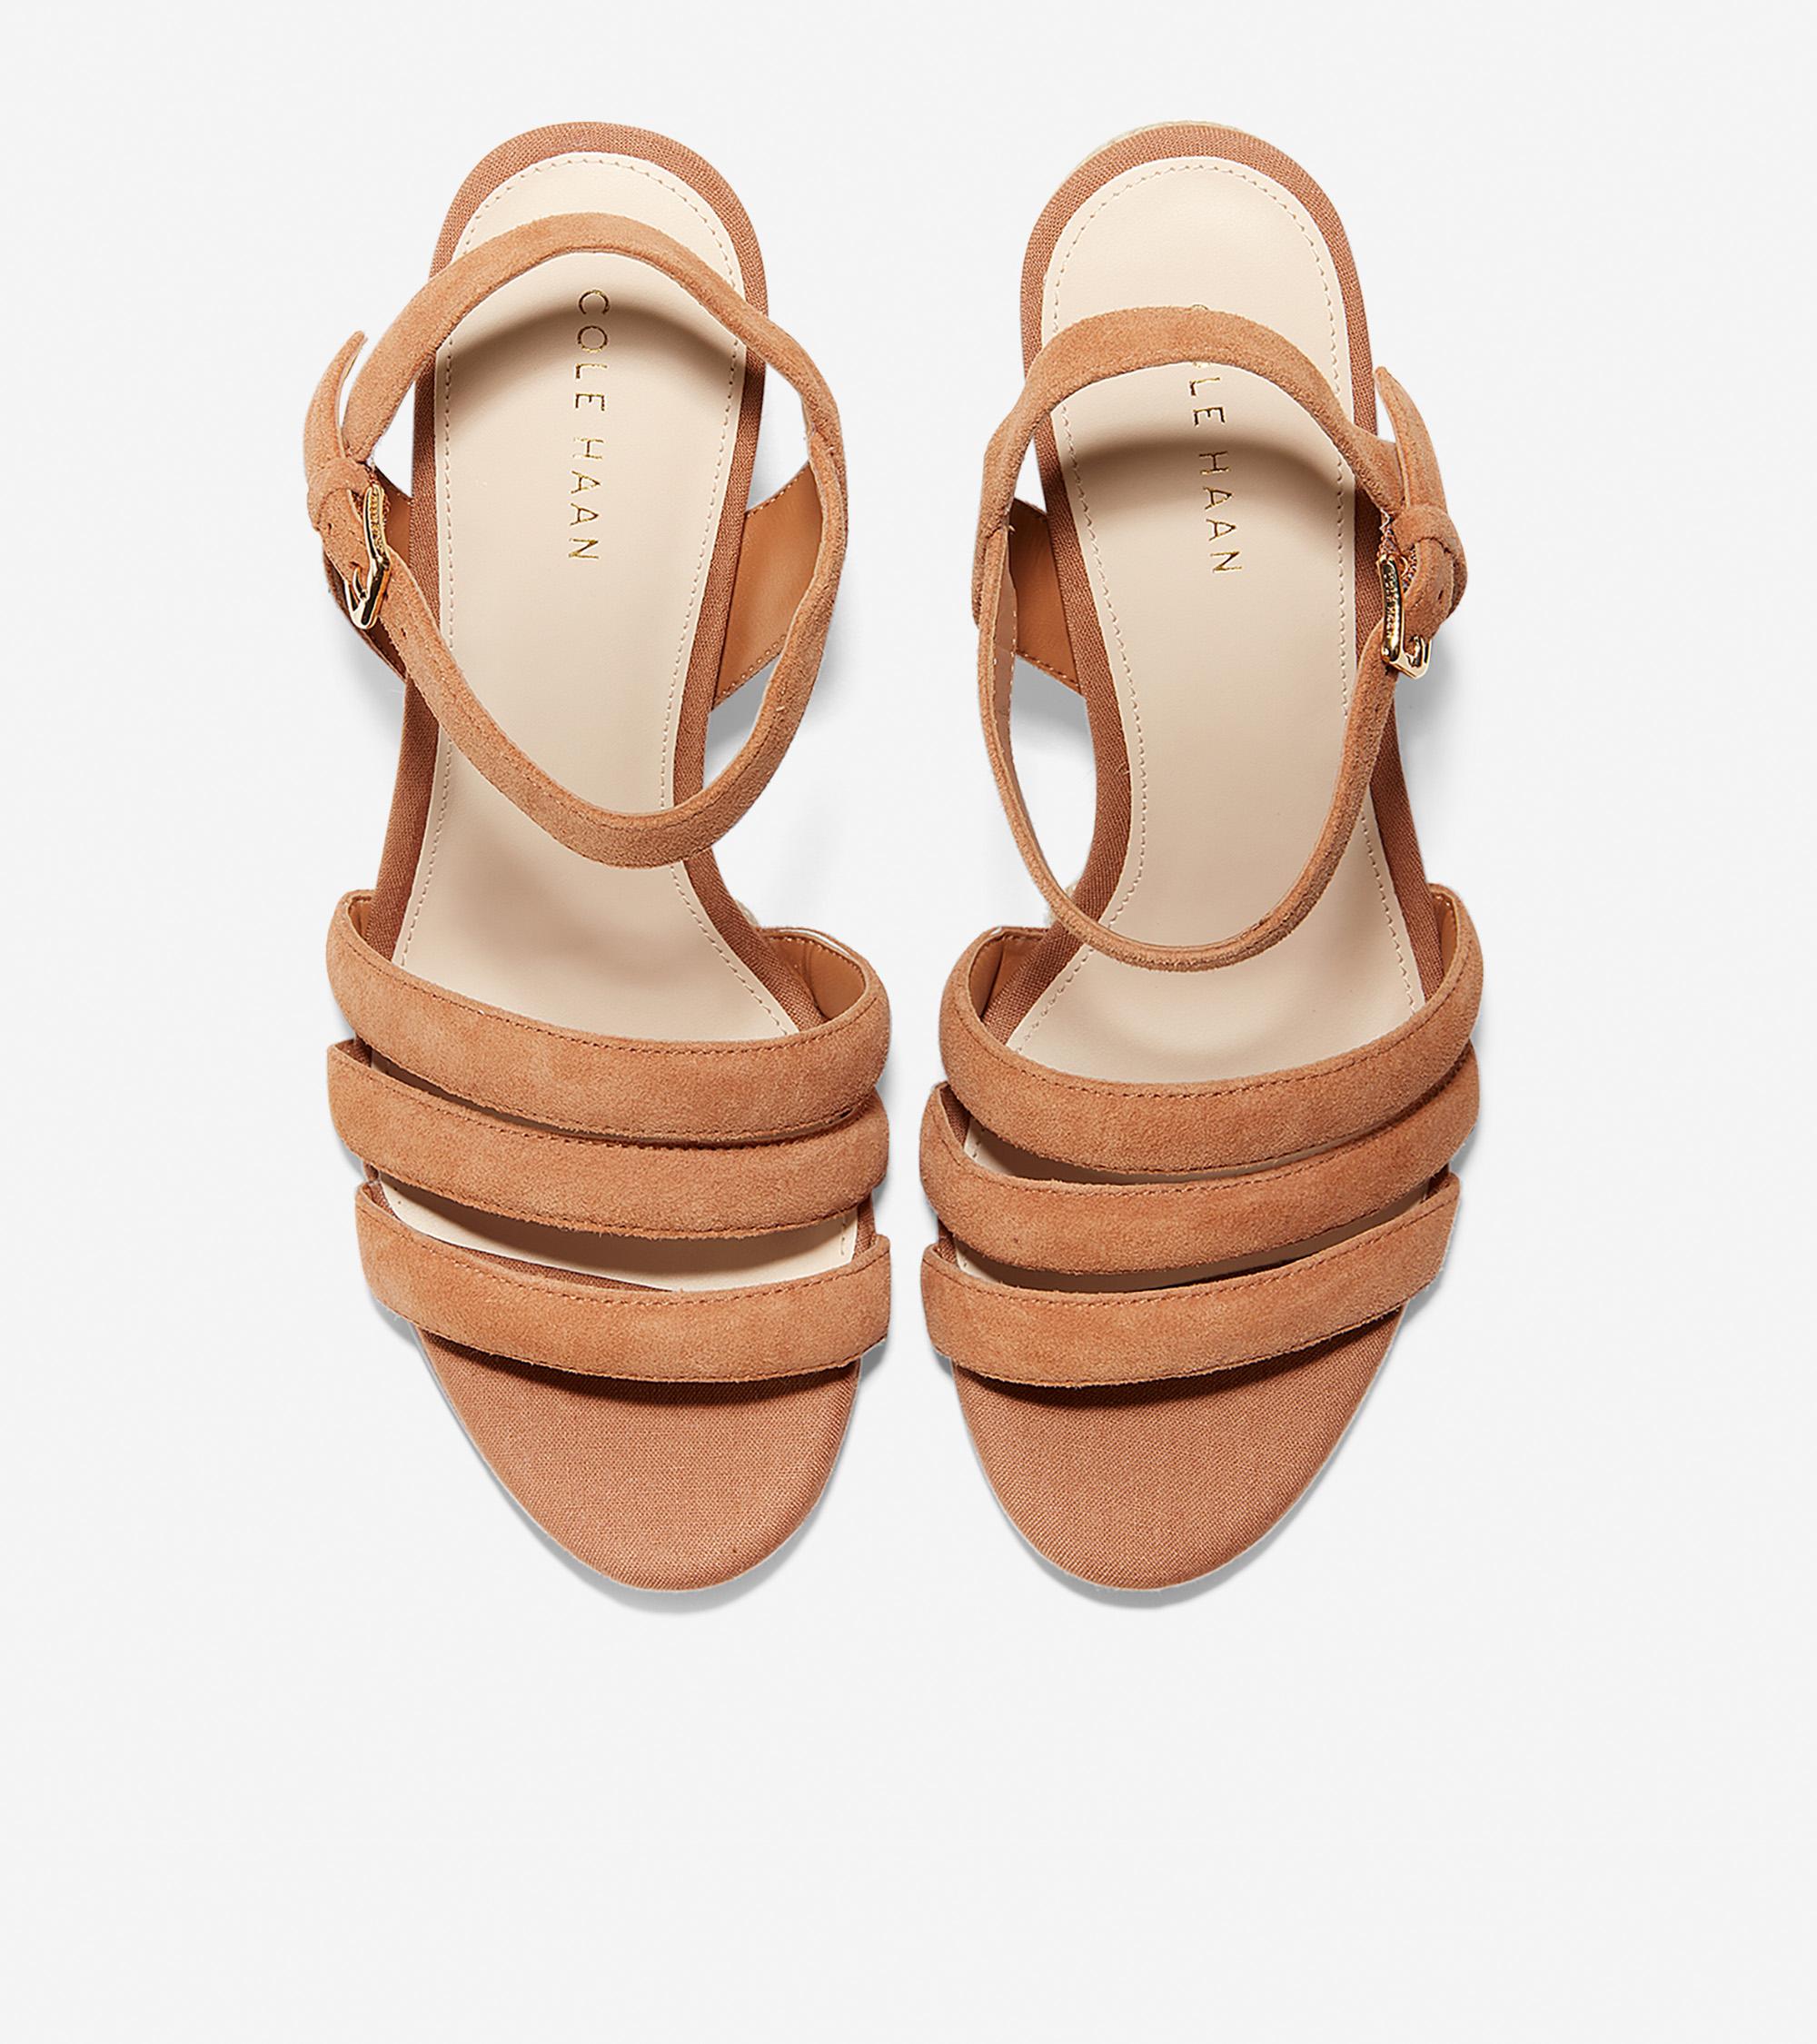 c3fb906b9da75 Women's Jasmine Espadrille Wedge Sandal (60mm) in Pecan Suede | Cole ...